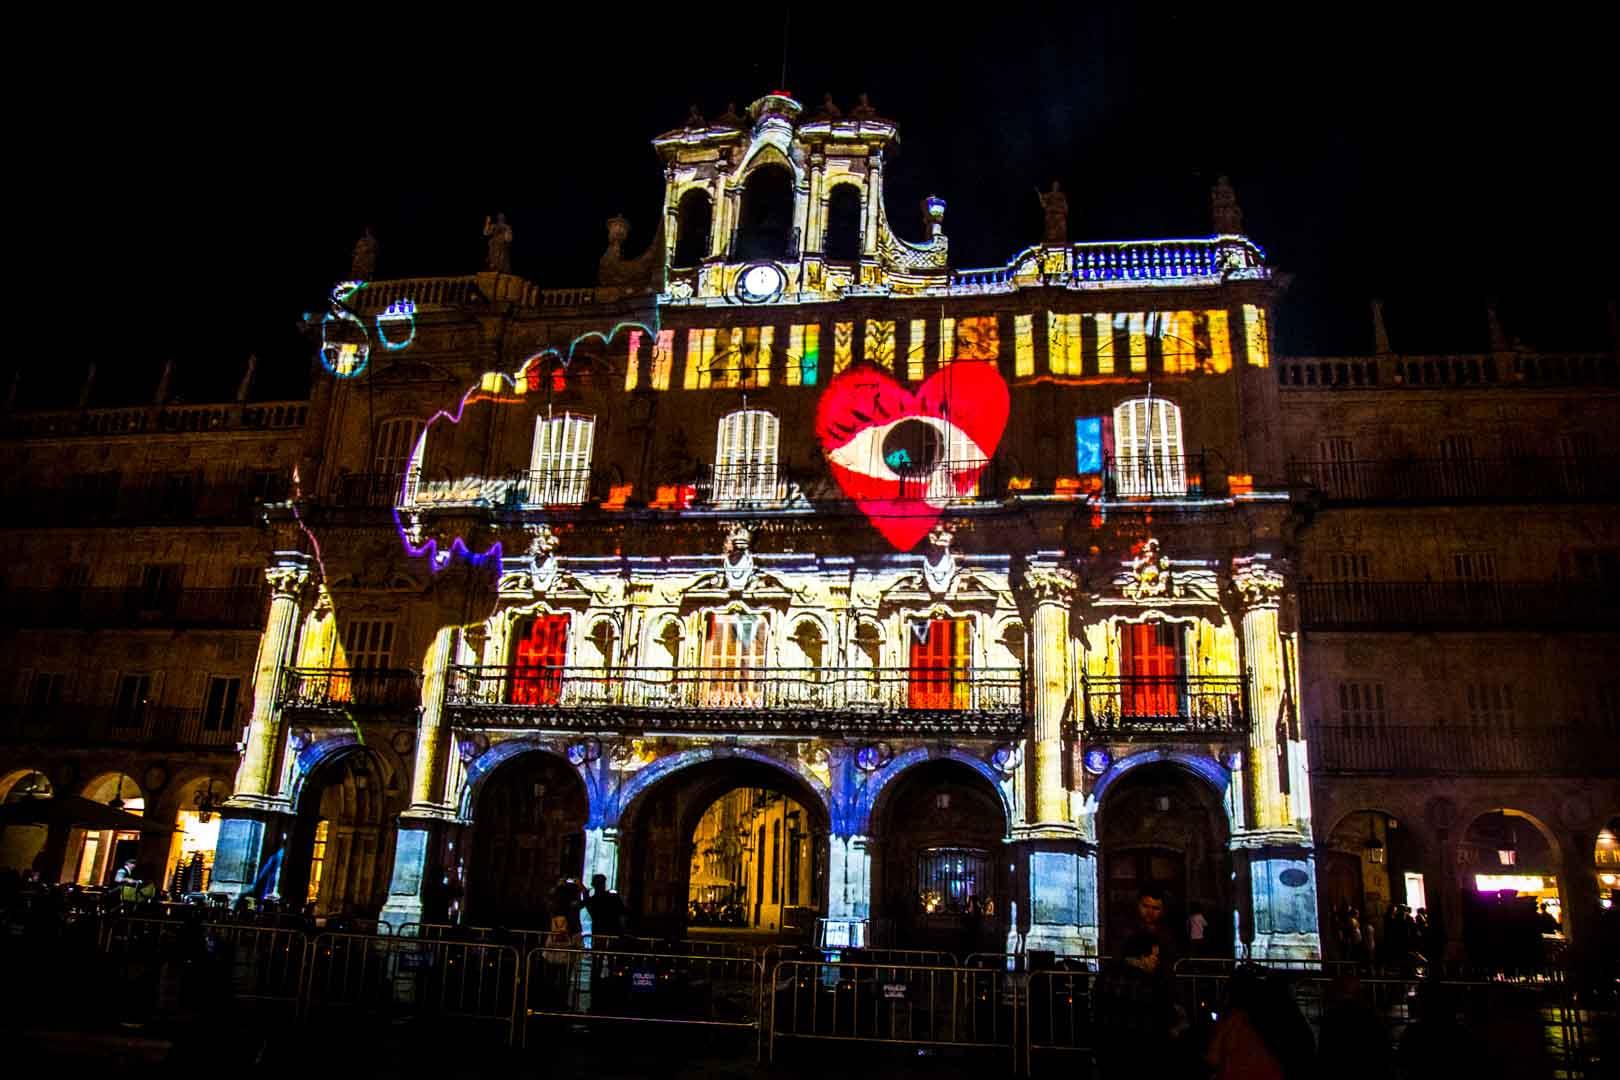 Visuales Nidra Festival Luz y Vanguardias Salamanca 2019 España Video Mapping